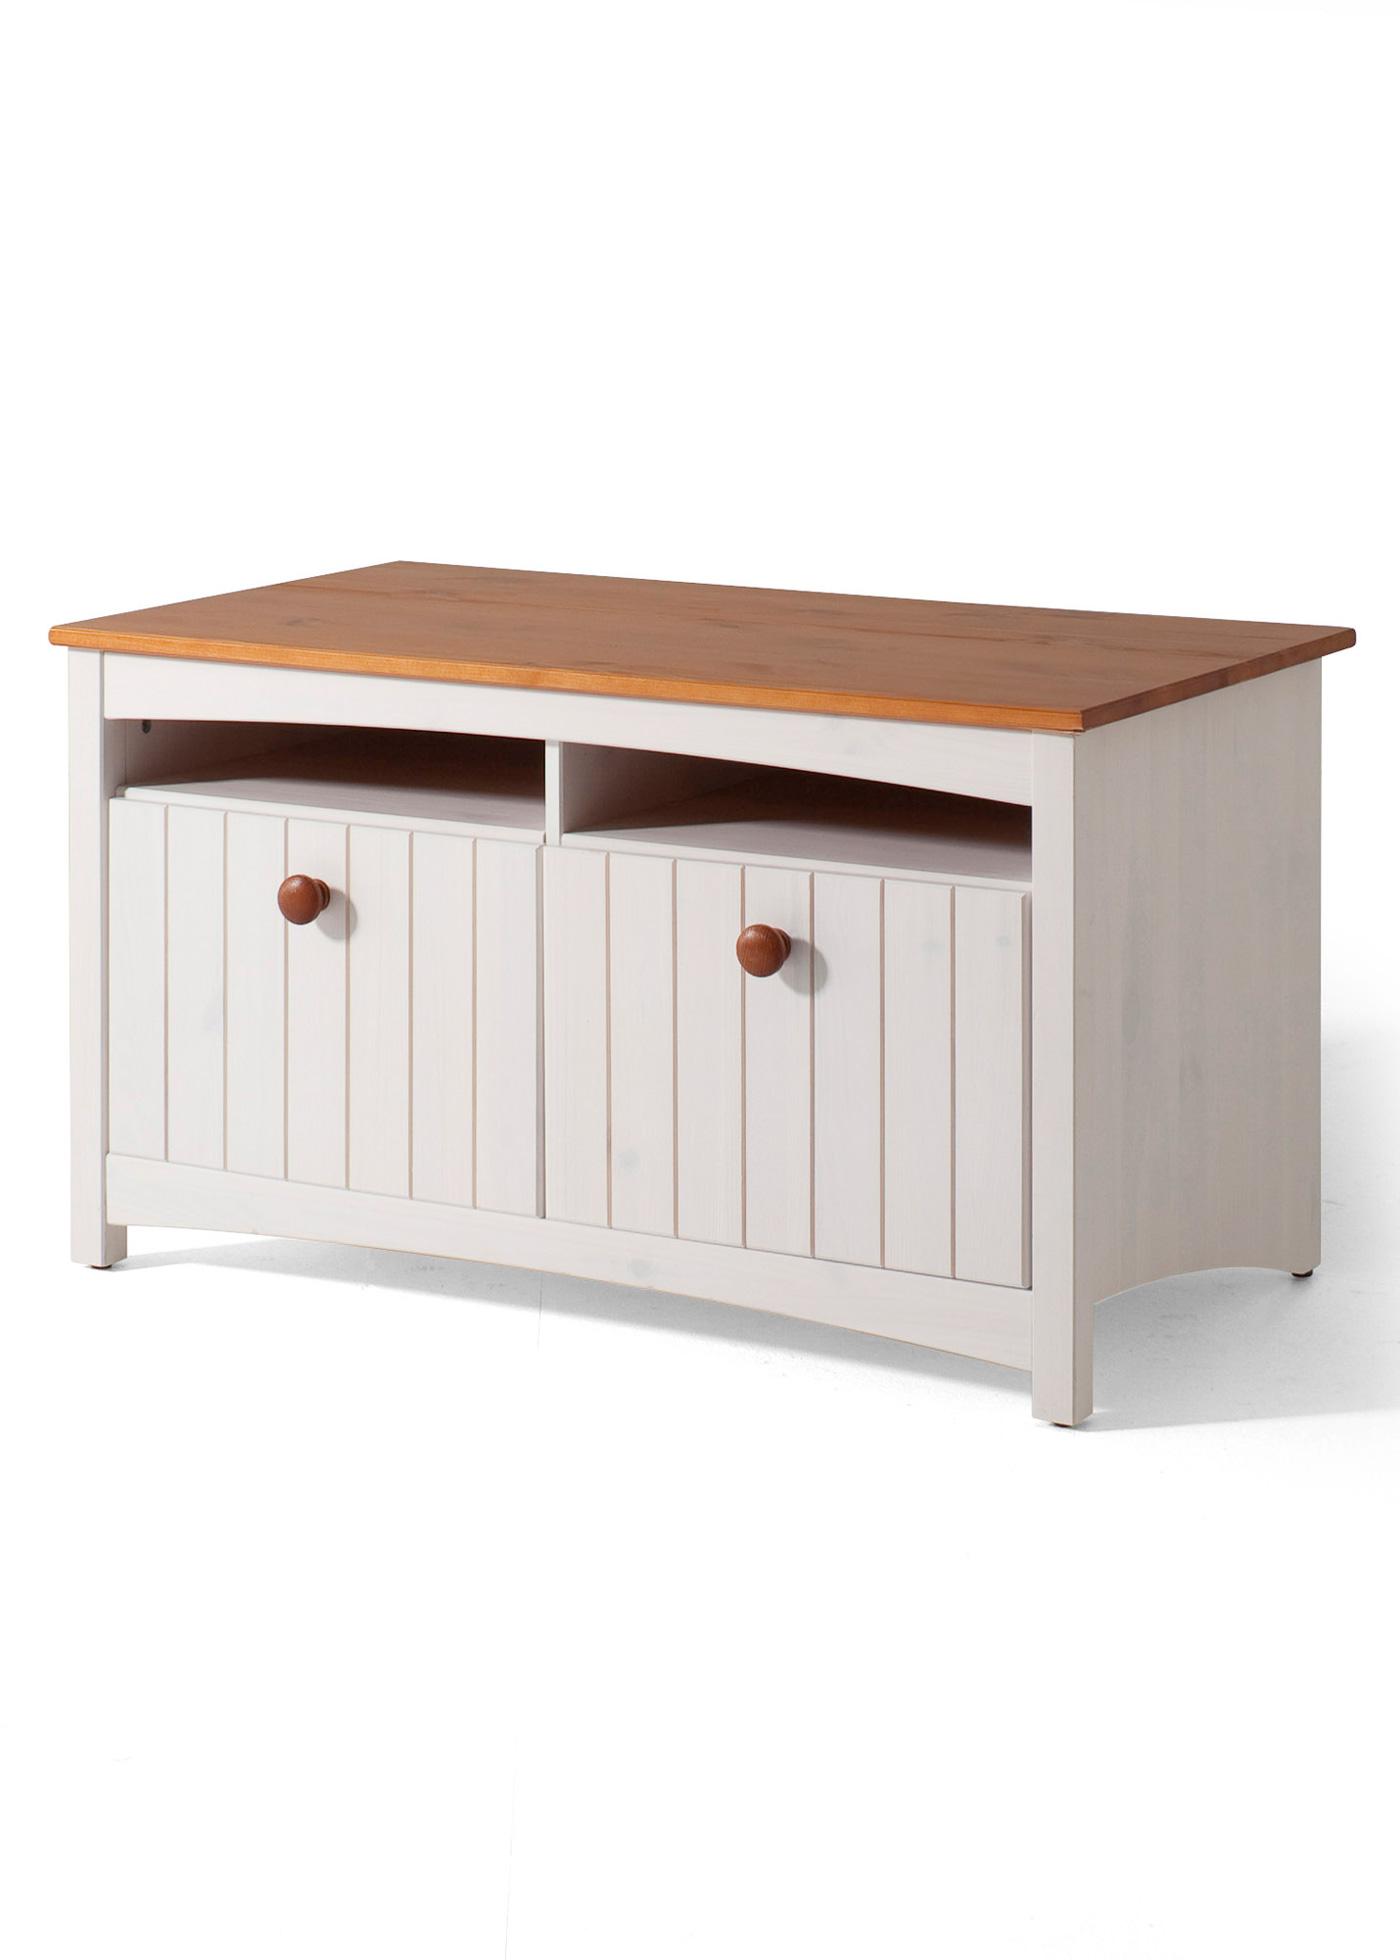 garten truhe bank preisvergleiche erfahrungsberichte. Black Bedroom Furniture Sets. Home Design Ideas